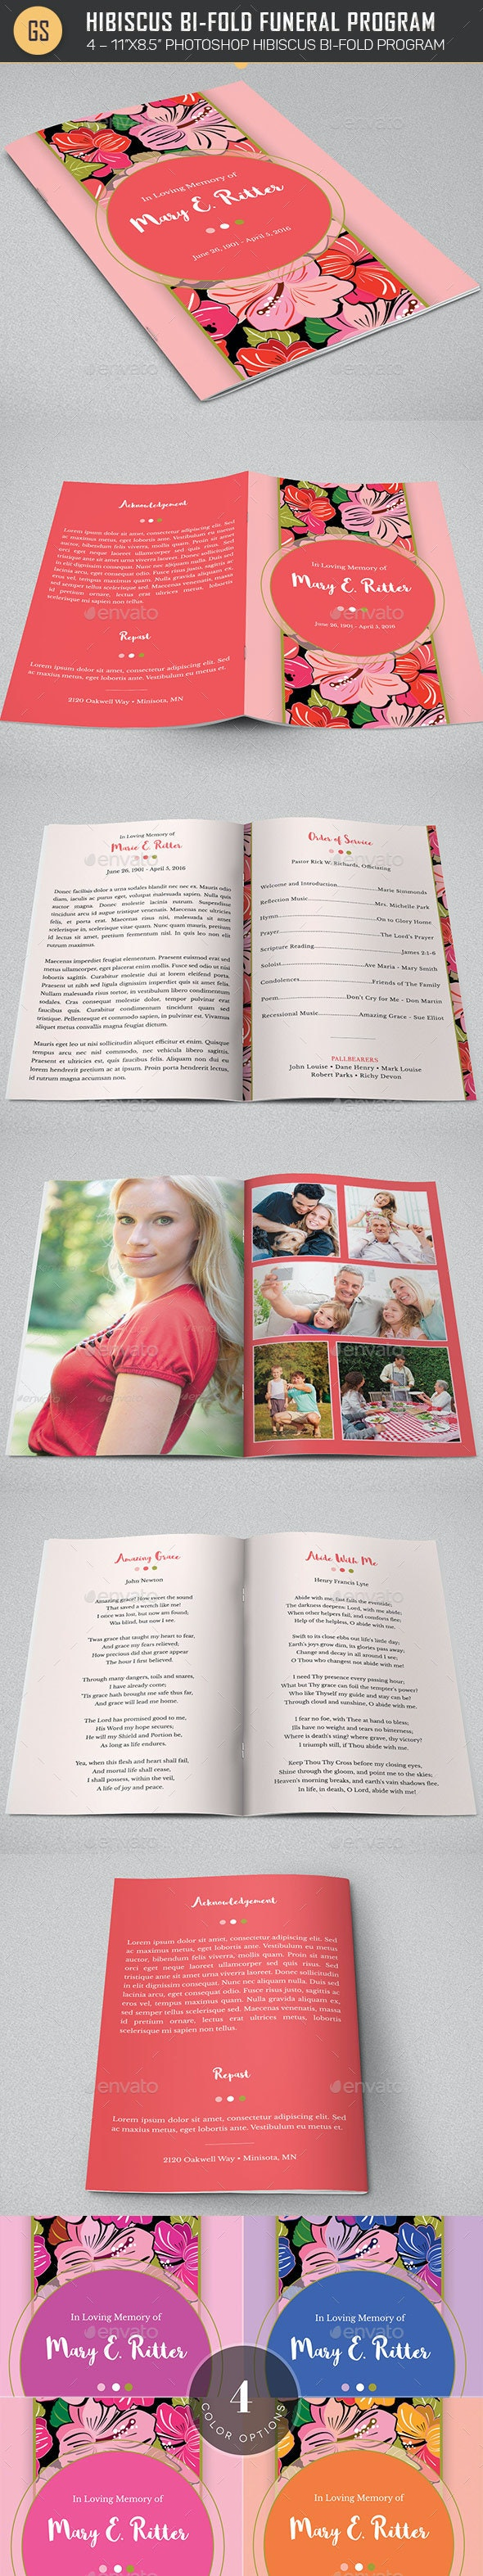 Hibiscus Bi-Fold Funeral Program Template - Informational Brochures